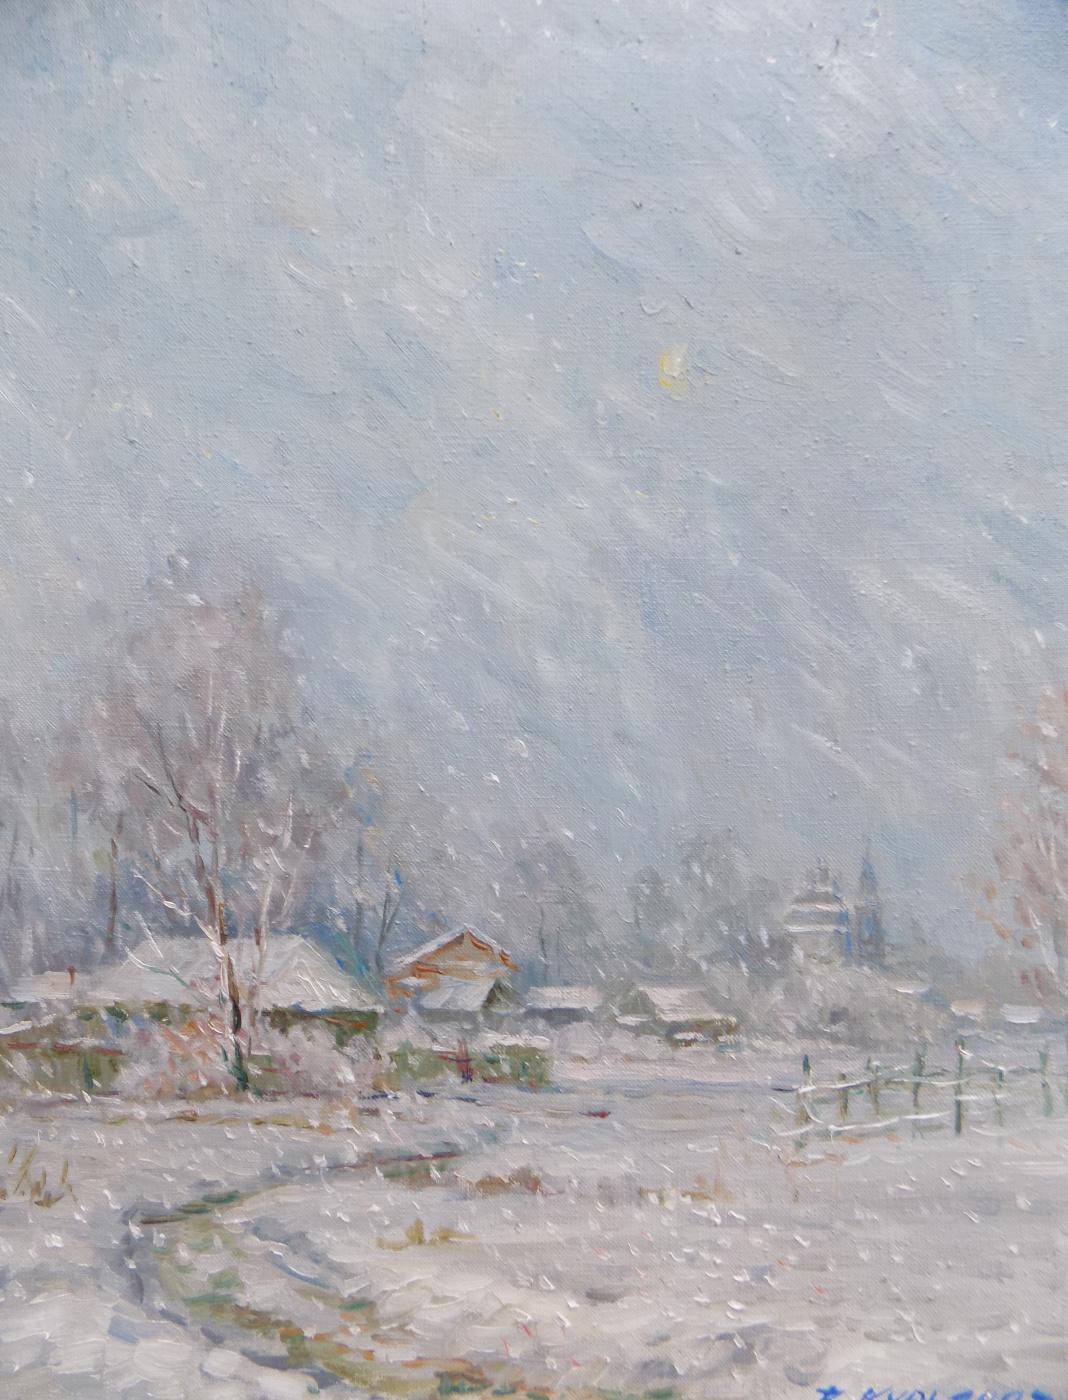 Victor Vladimirovich Kuryanov. The midnight blizzard has ceased